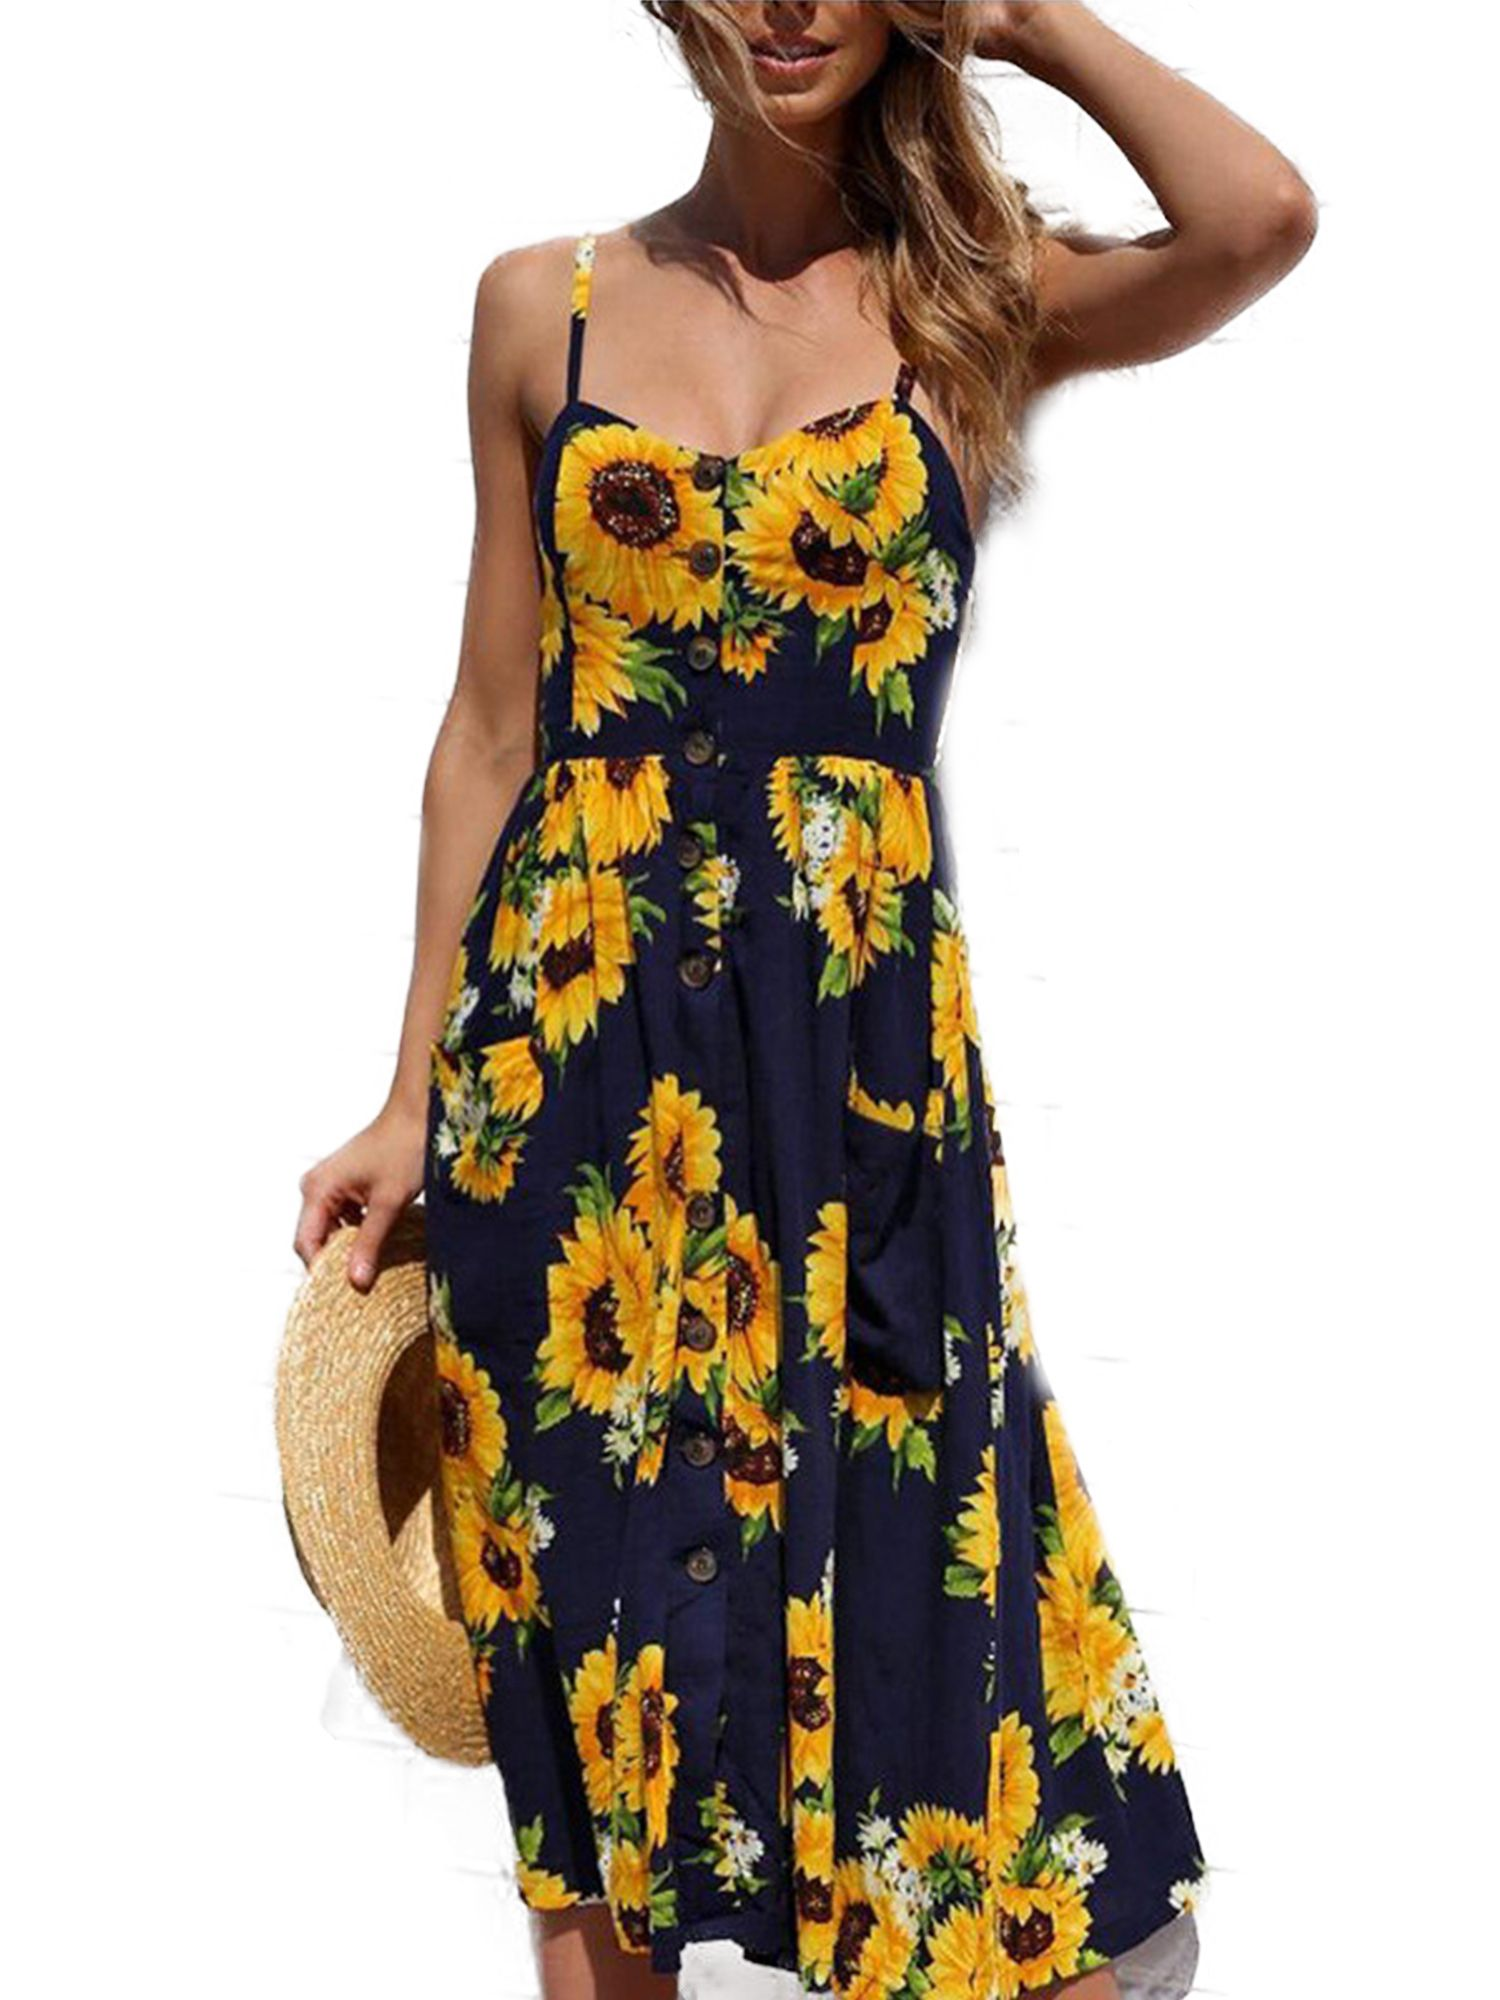 Wodstyle Women S Strappy Floral Summer Beach Party Midi Swing Dress Walmart Com Summer Dresses For Women Midi Swing Dress Backless Mini Dress [ 2000 x 1500 Pixel ]